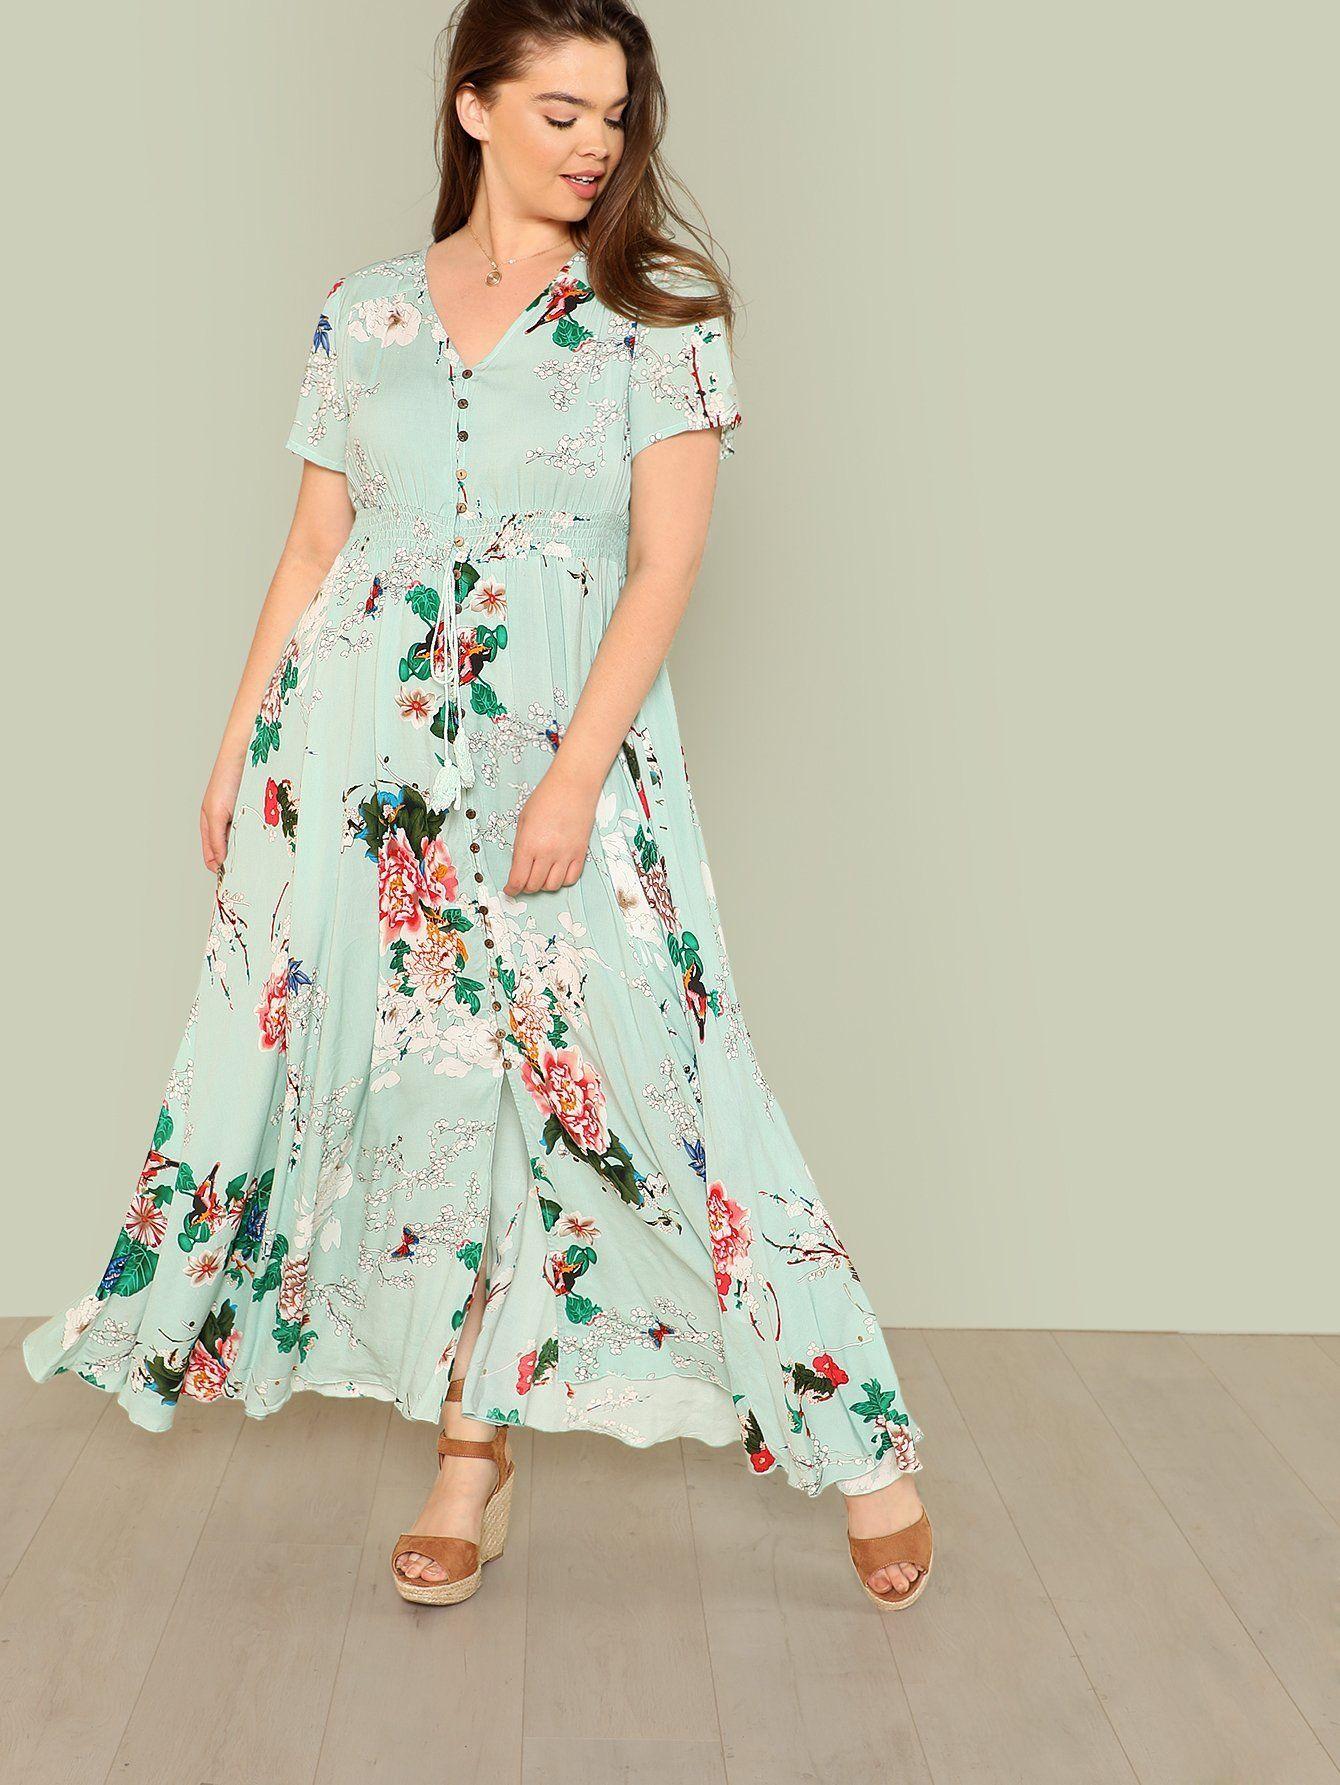 c38958d797c Button Up Fit Flared Floral Dress